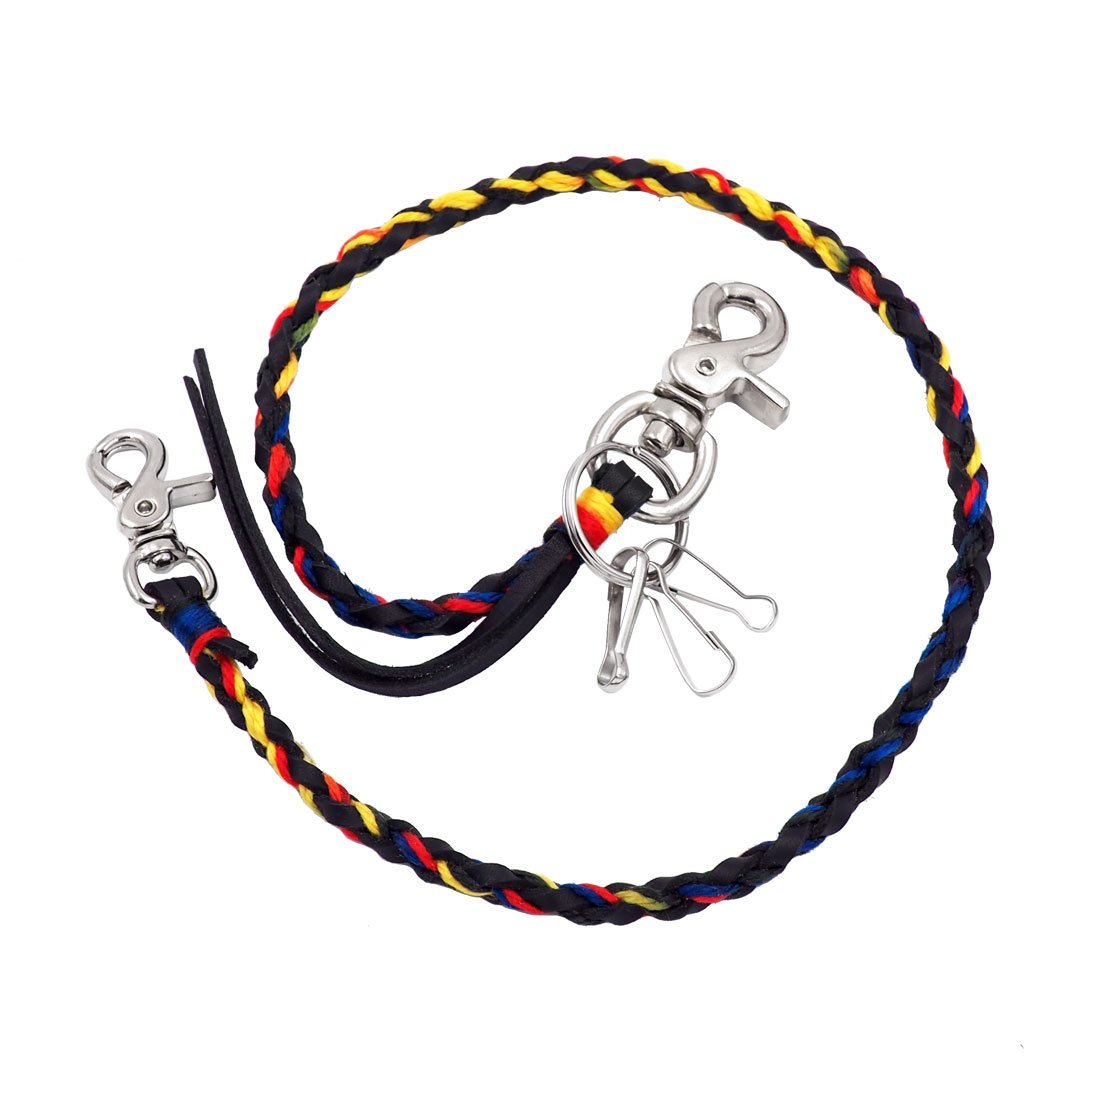 Uniqsum Braided Genuine leather wallet chain Swivel Trigger snap Biker Punk Key chain (Vivid Black)